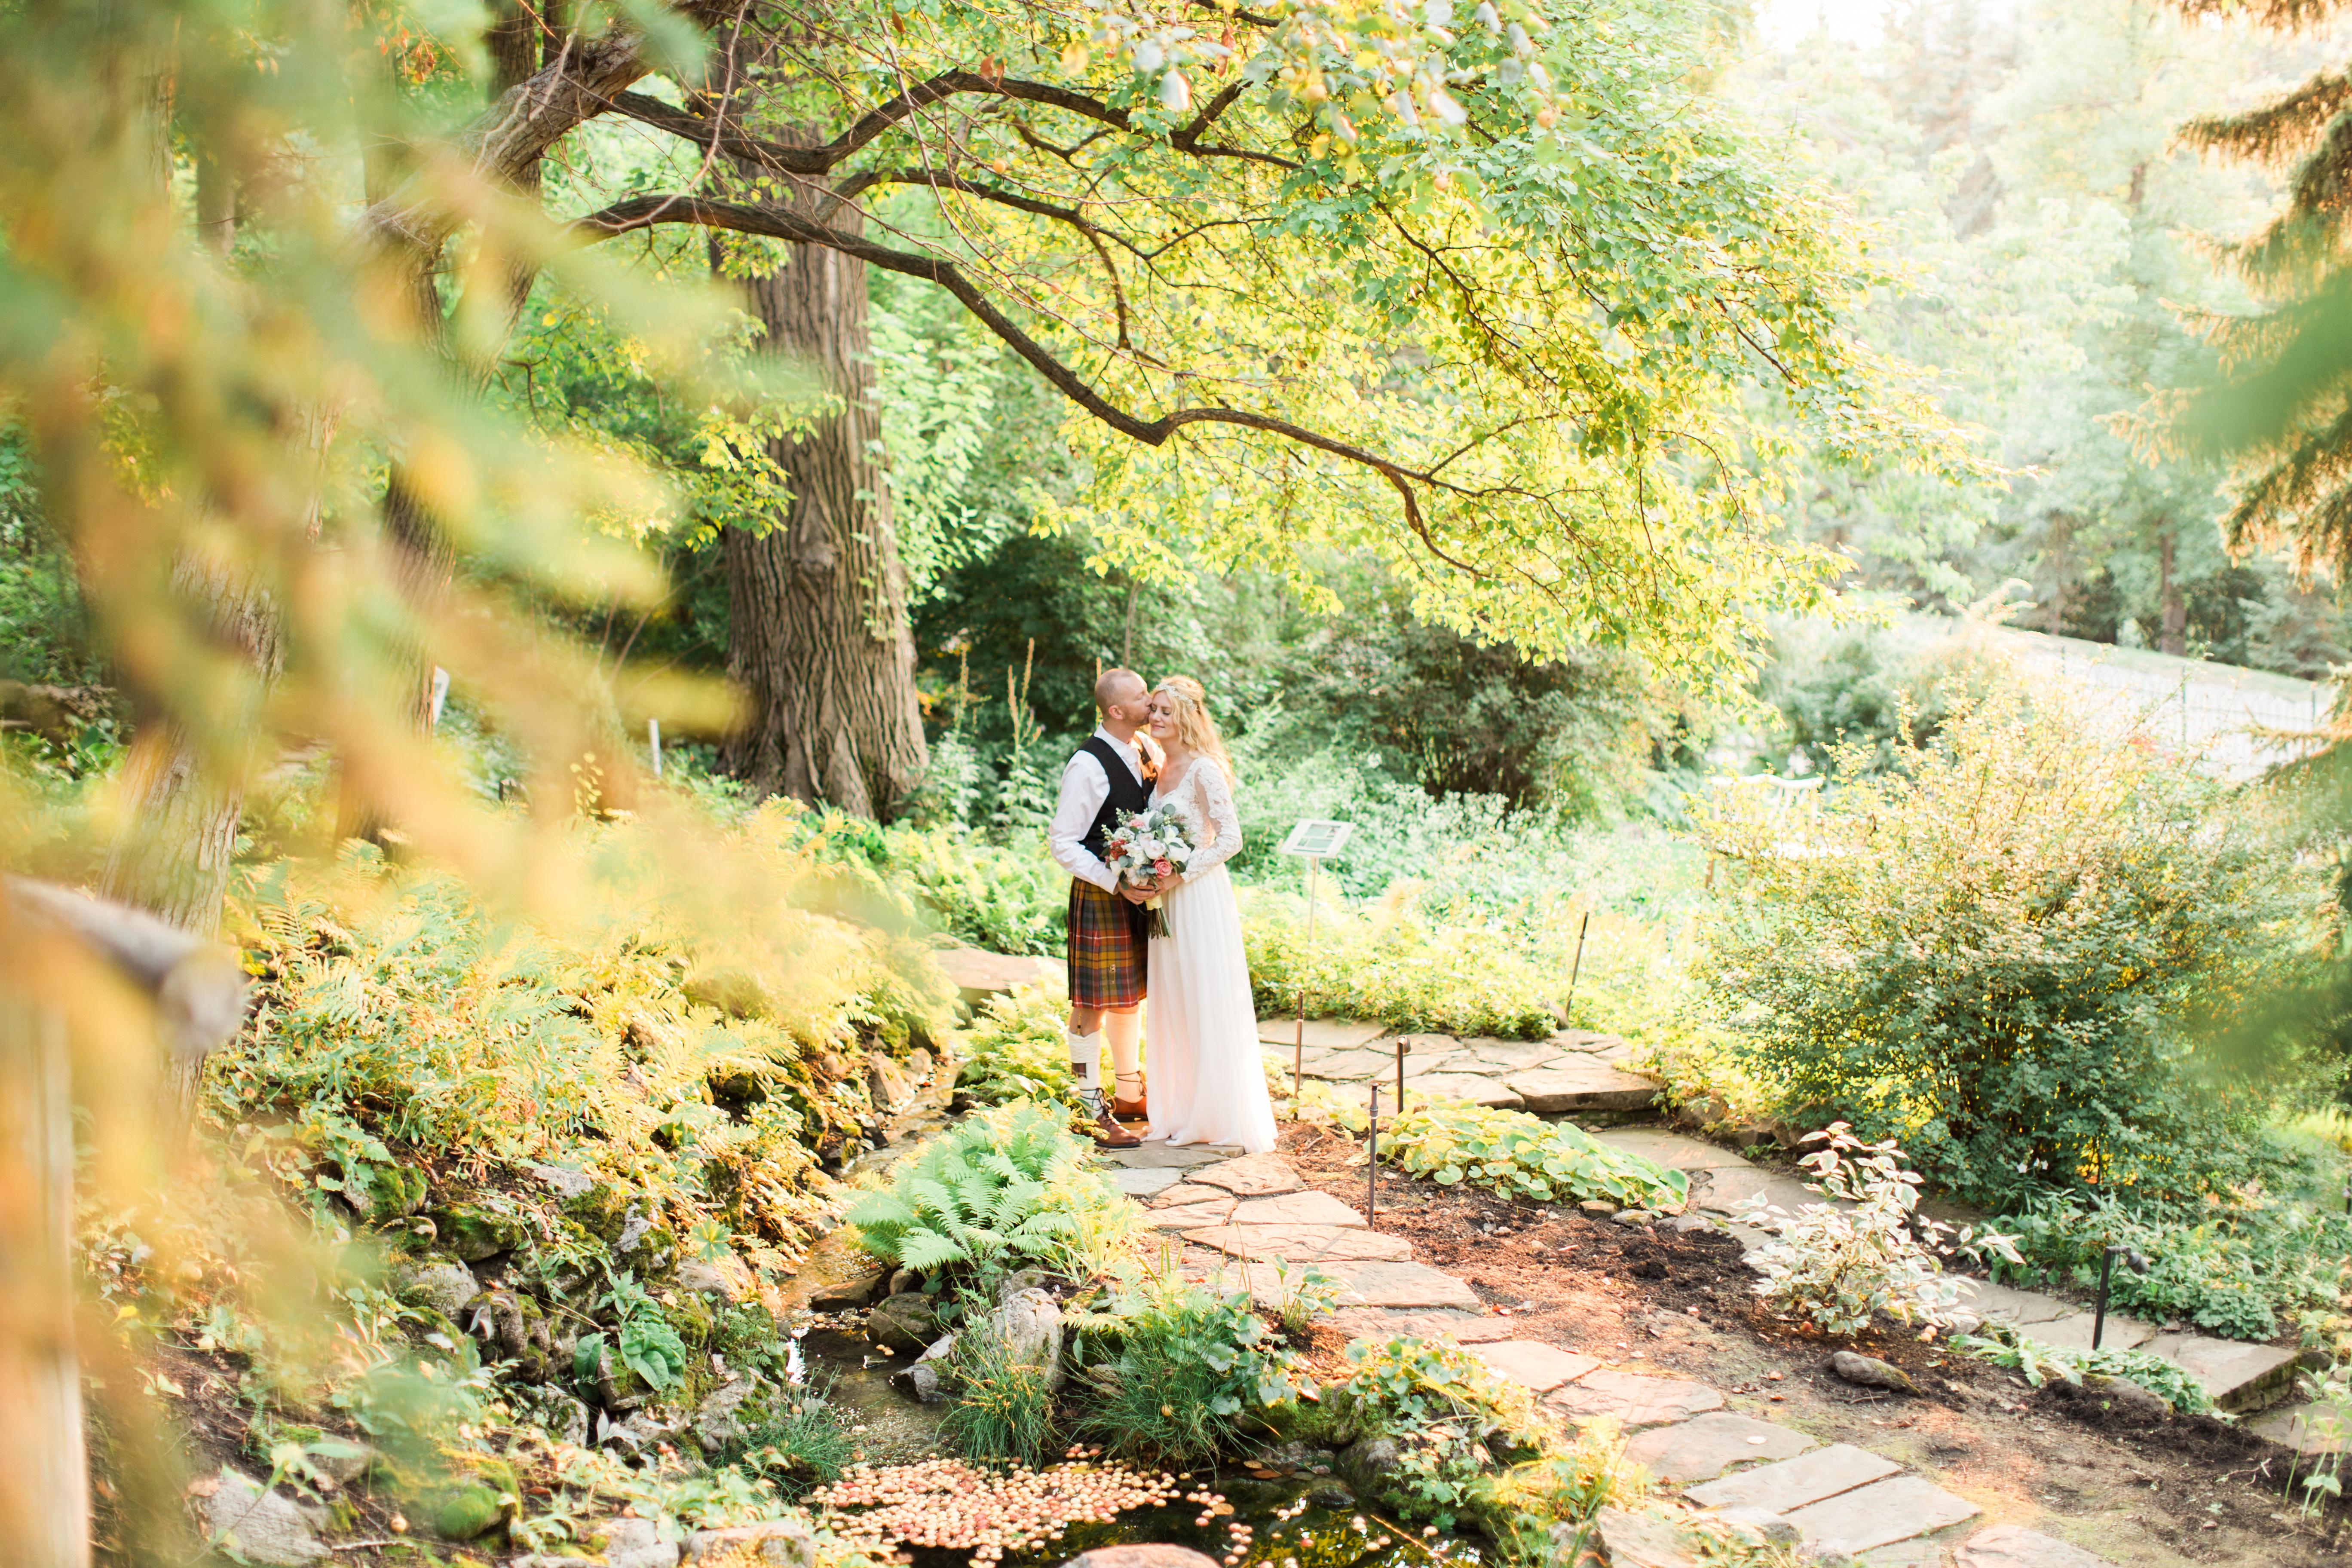 Calgary Wedding Photographer Reader Rock Garden Cafe Golden Light Light Airy Fairy - 22